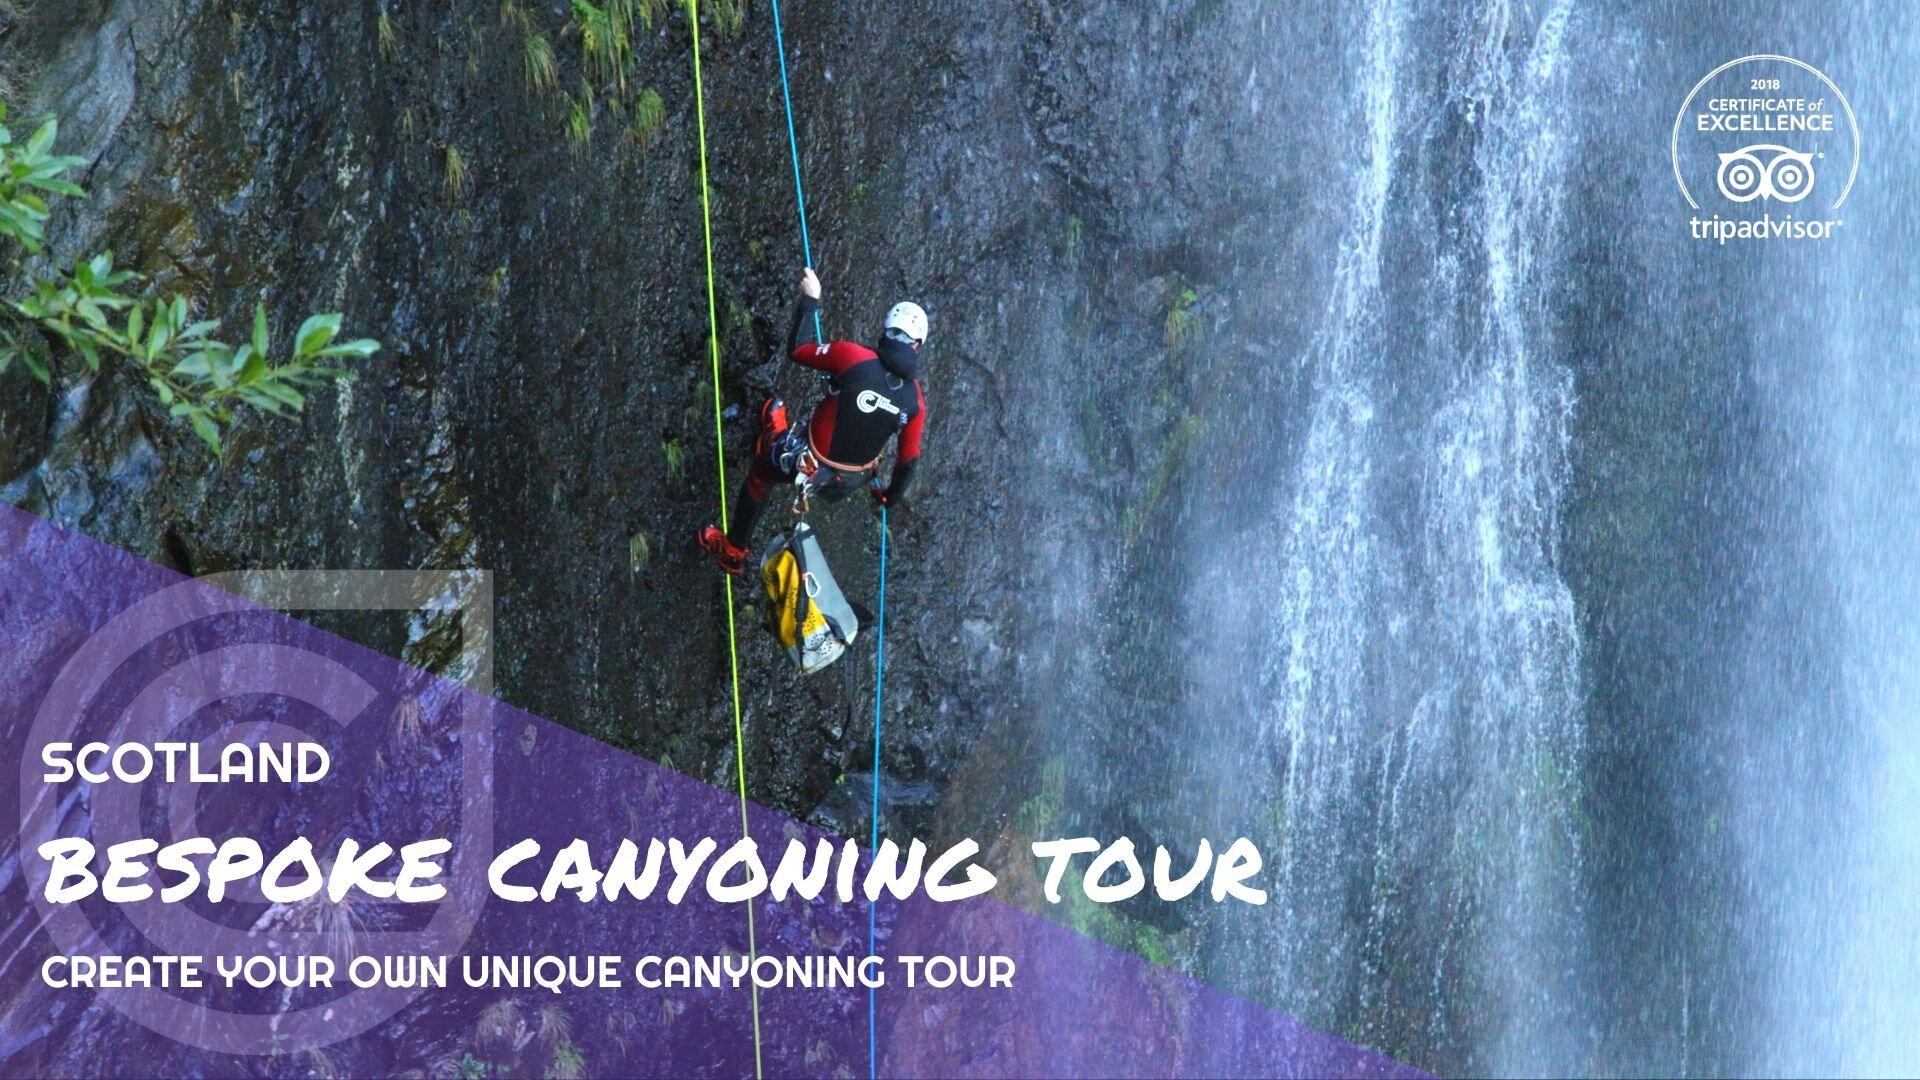 Bespoke Canyoning Tour